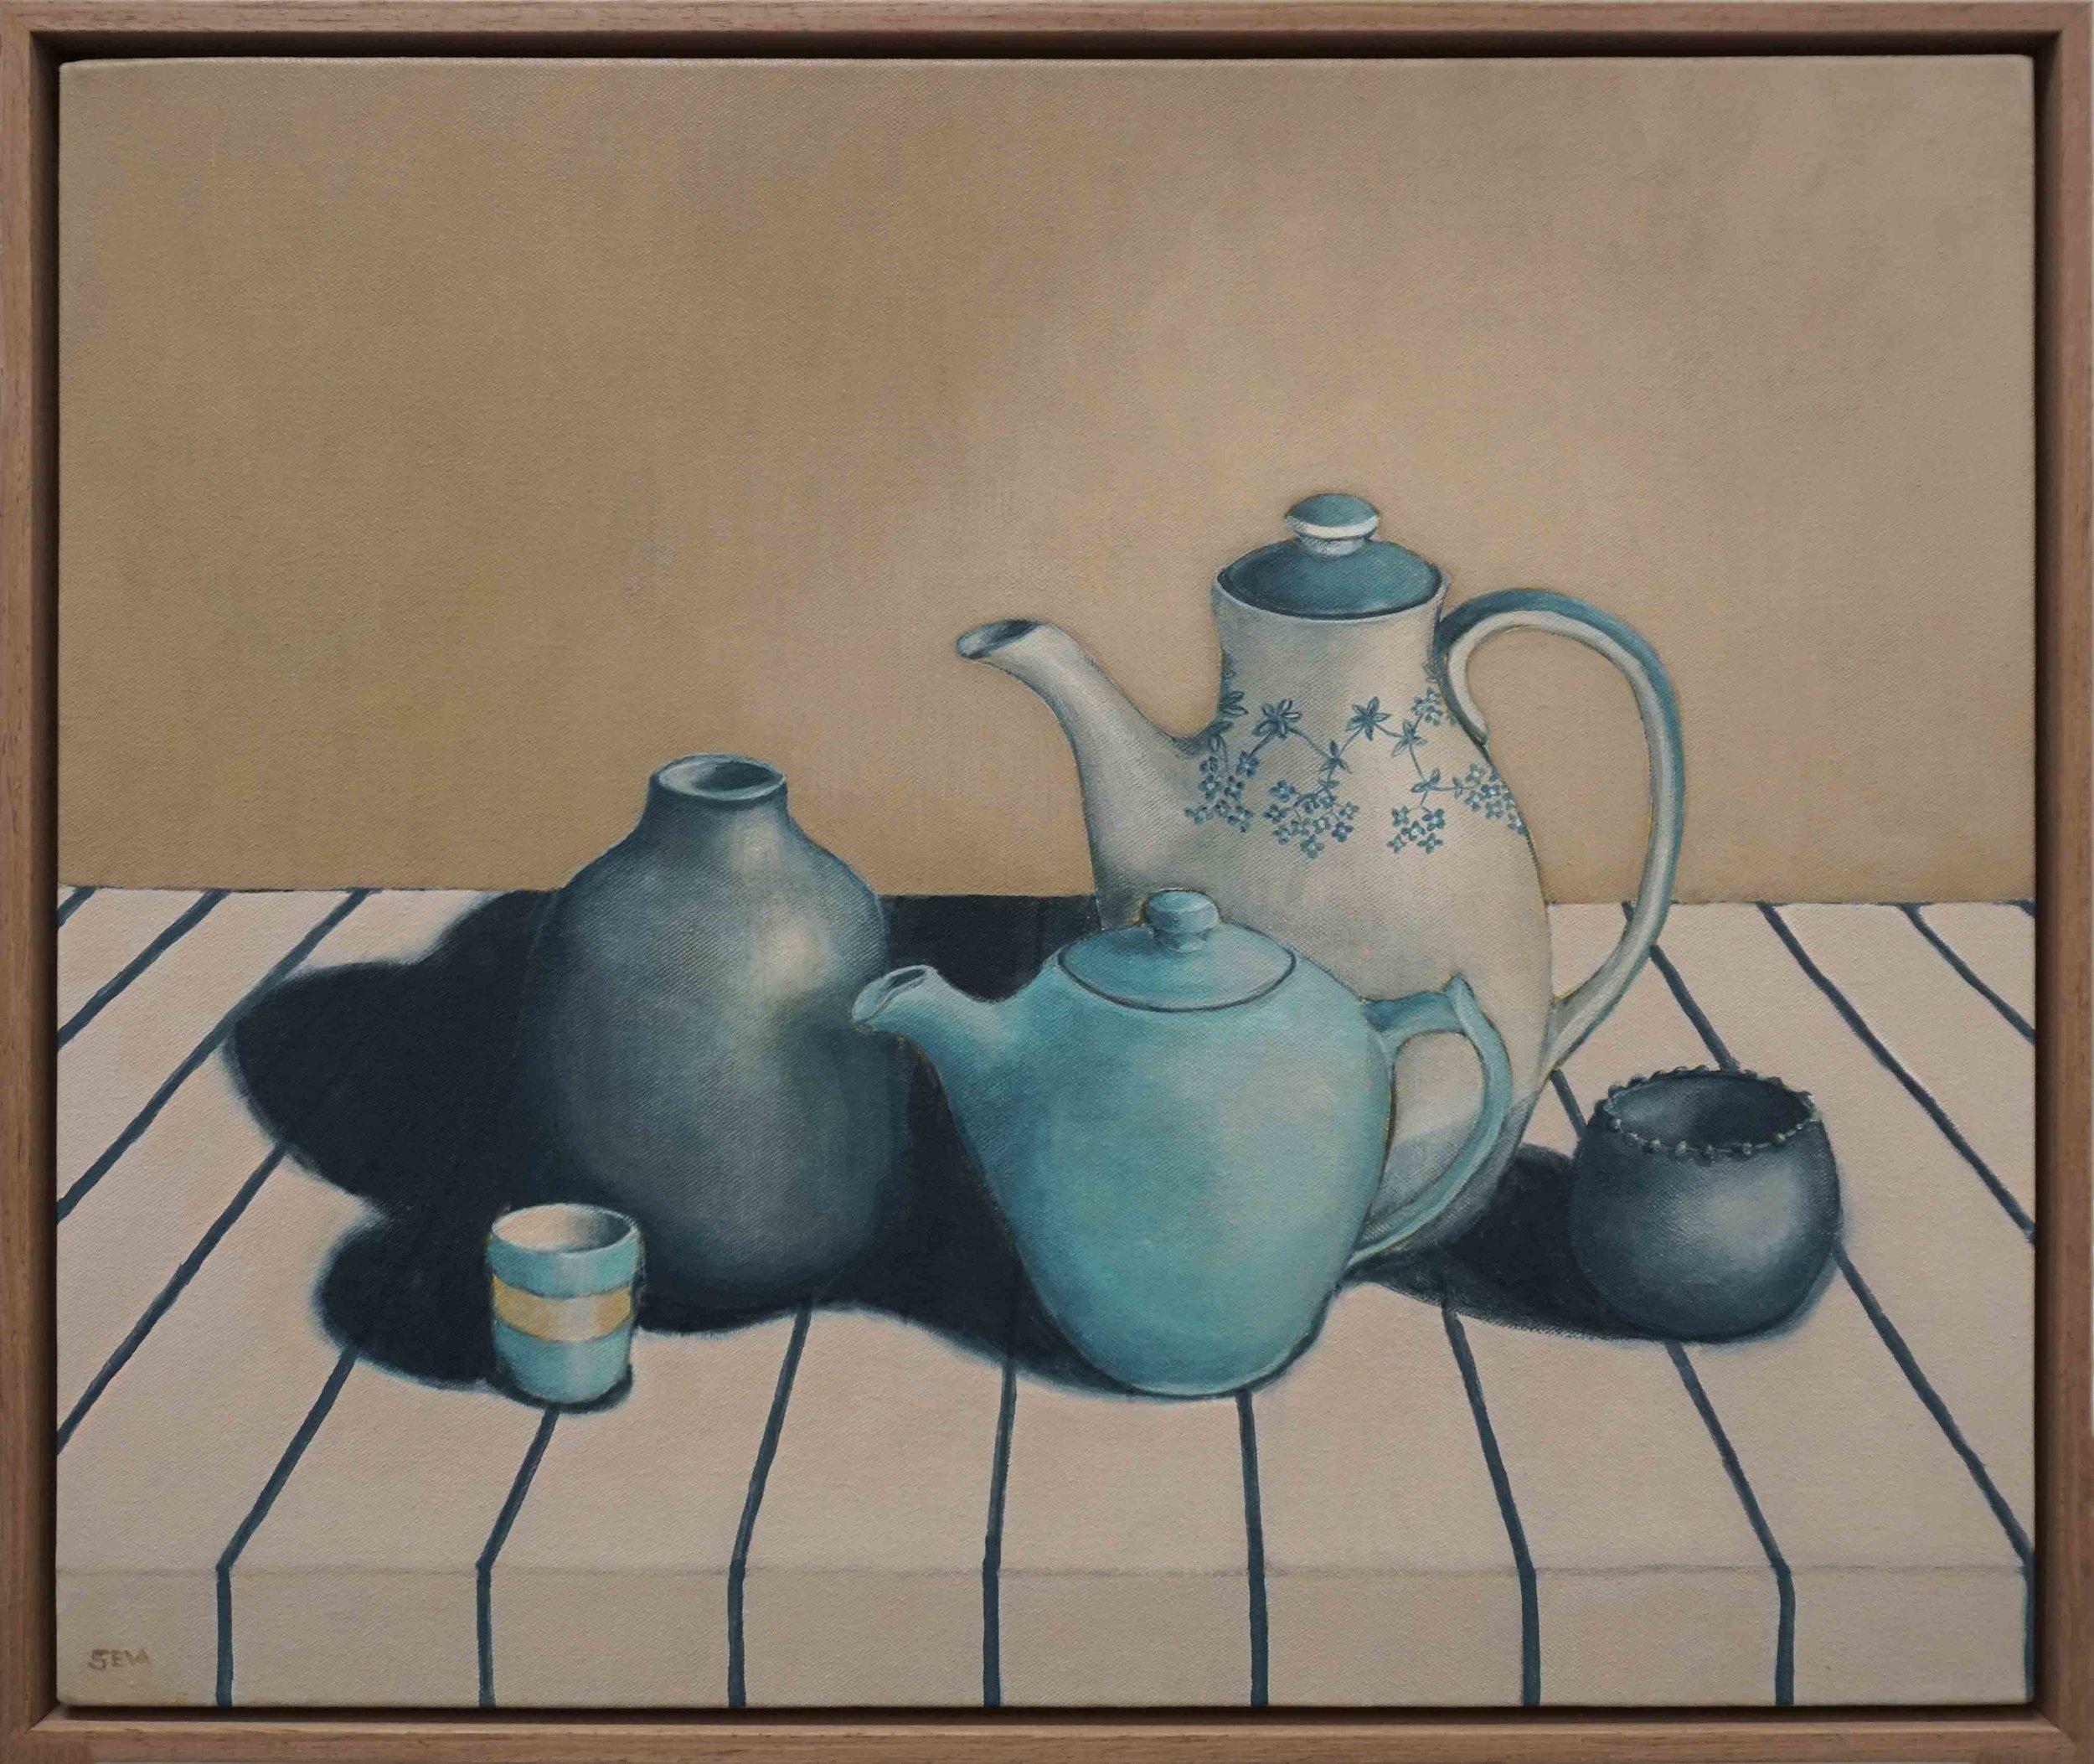 5. Sue Eva, 'Tea with Molly', 2018, Acrylic on canvas, 50 x 62cm, $795